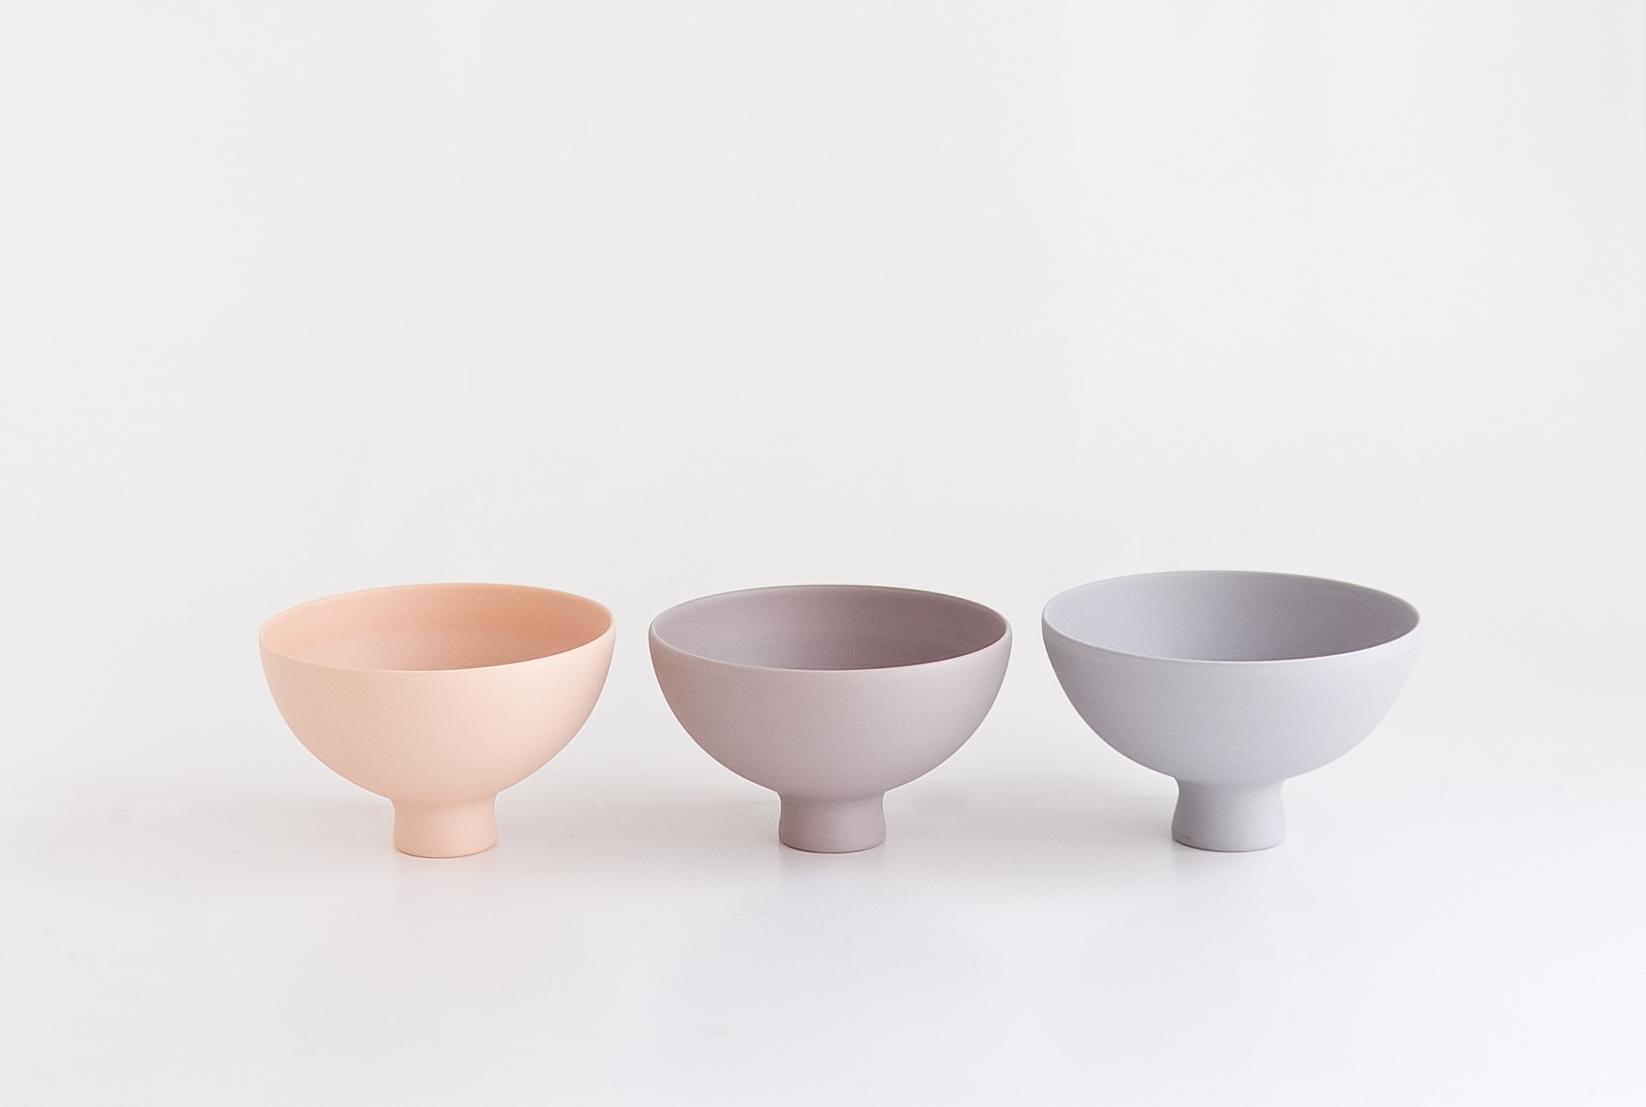 b11_mdba_mdby_ceramics_manufactured_porcelain_mushimegane_books